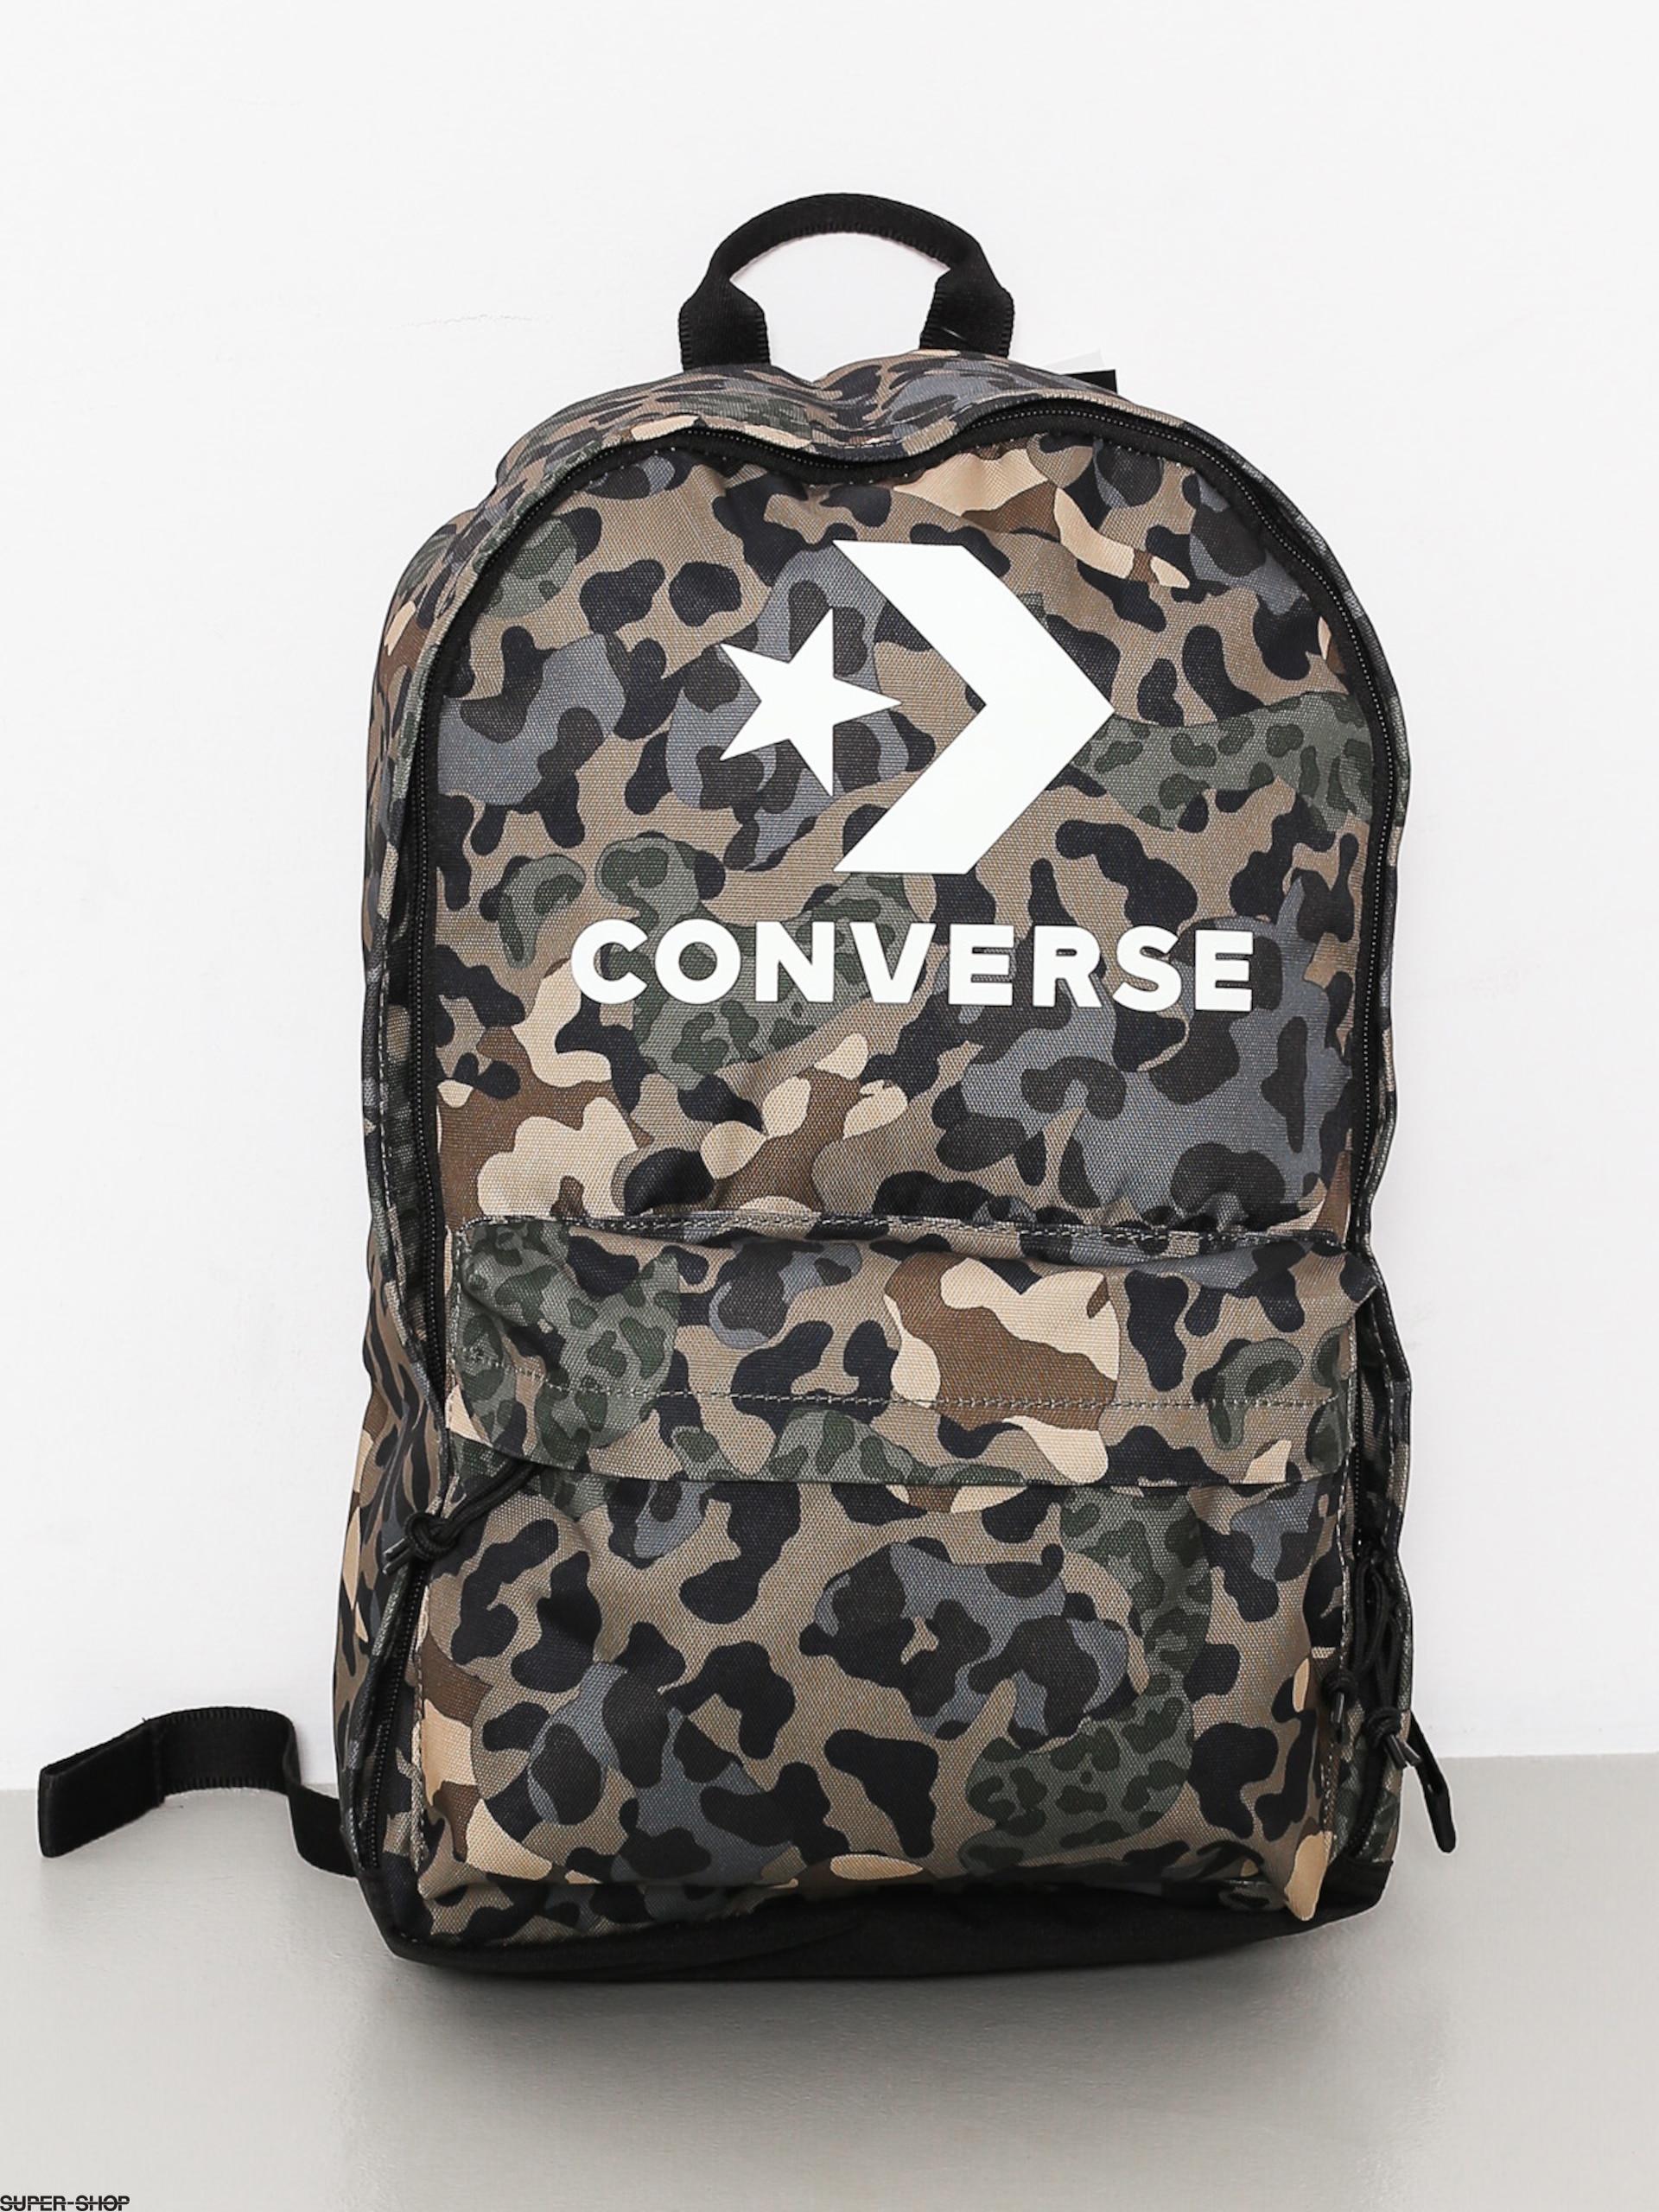 585e99aff9d9 Converse Backpack Edc 22 (animal black white)